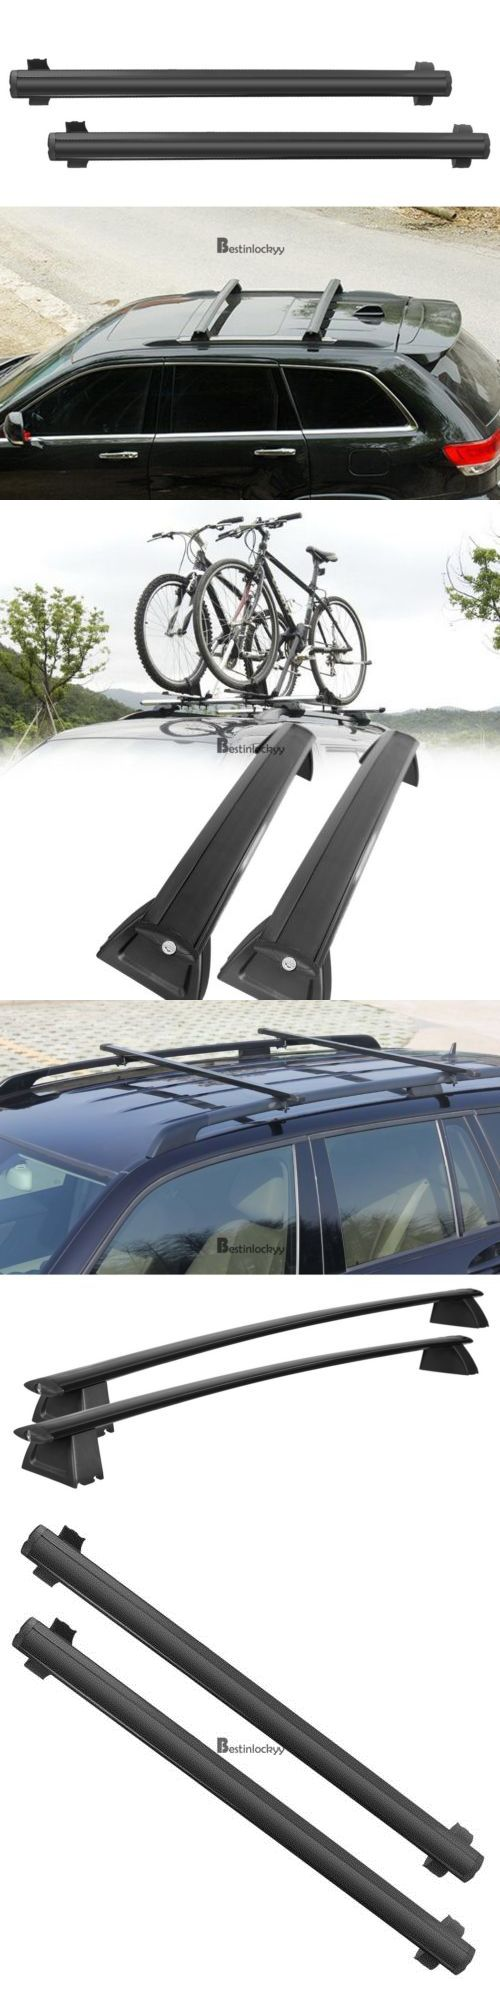 Other kayak canoe and rafting 36123 roof rack cross bars set bike for 2011